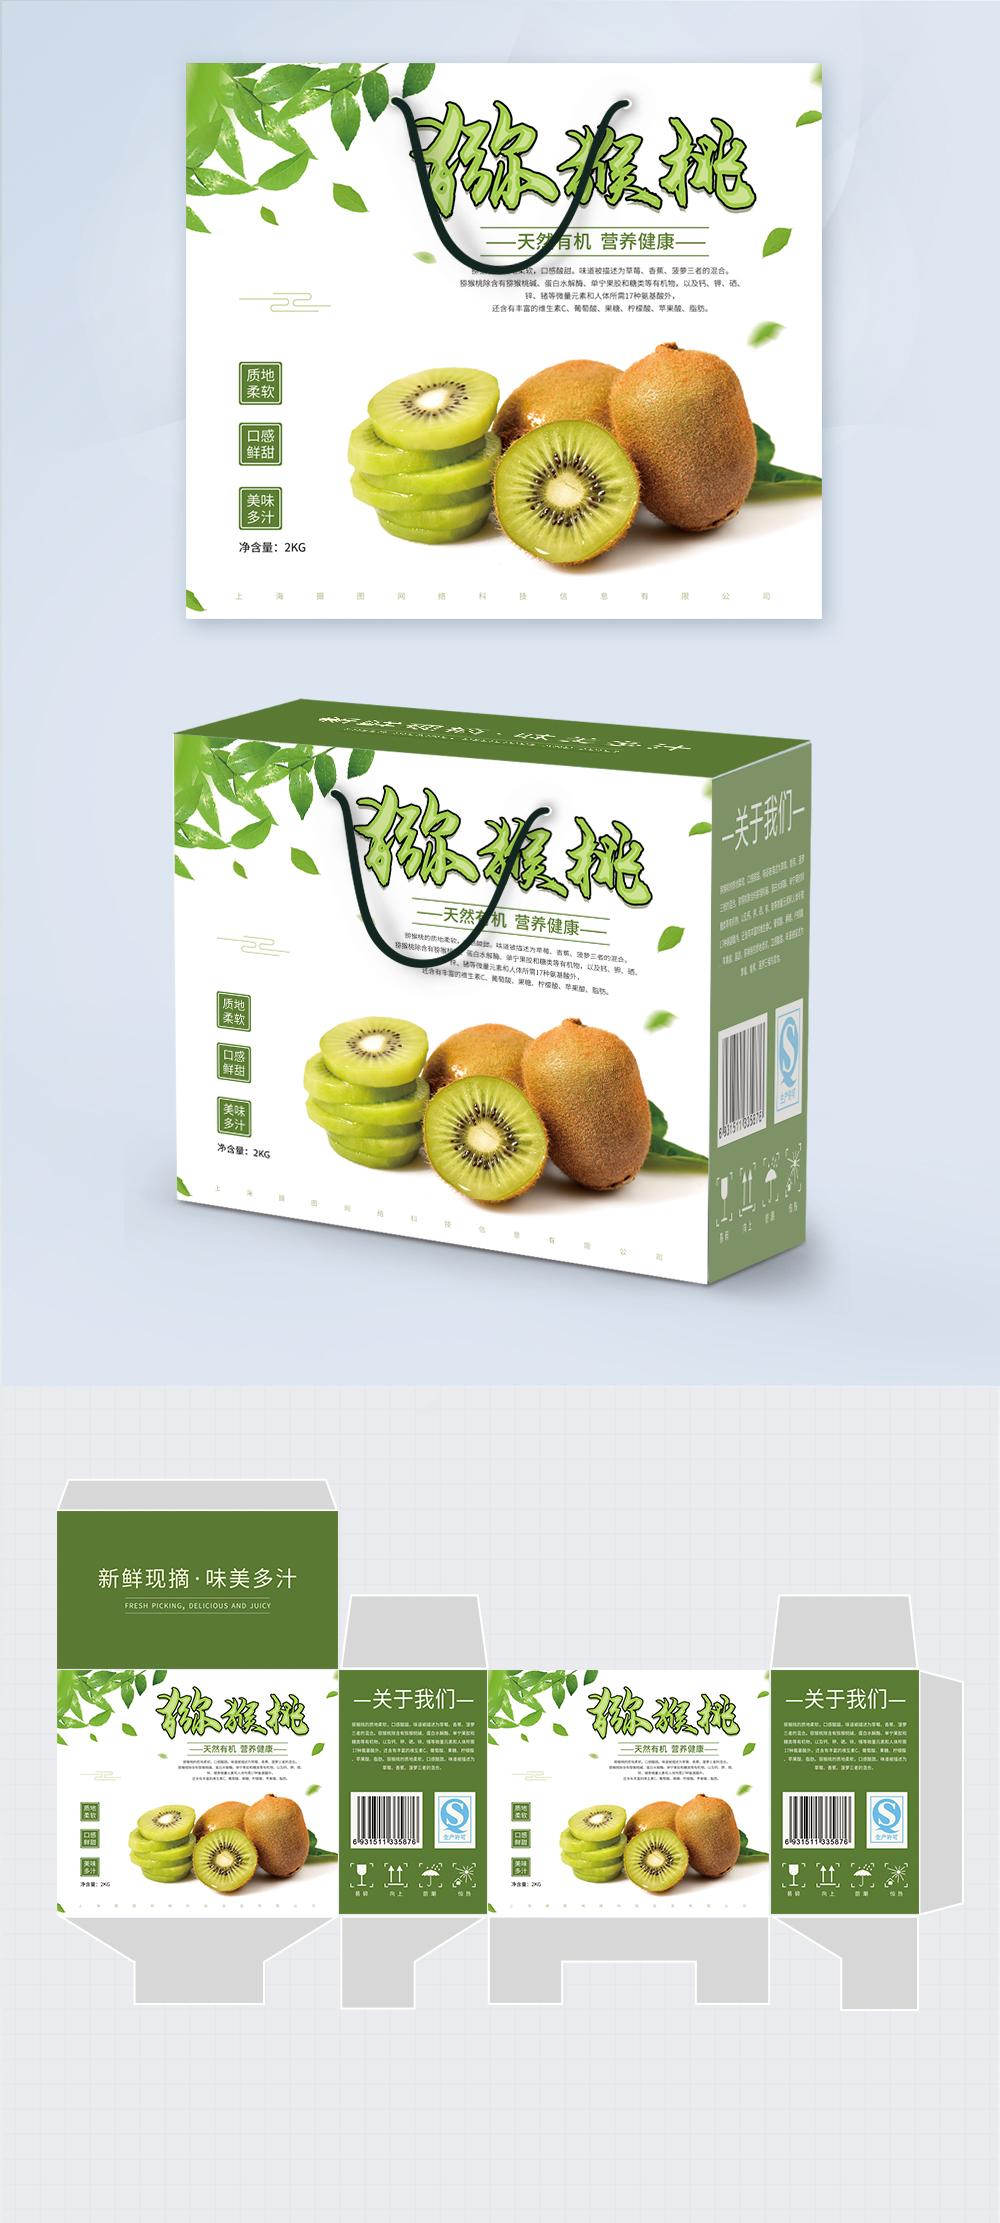 Plantillas Kiwi/® Frescas 4-5